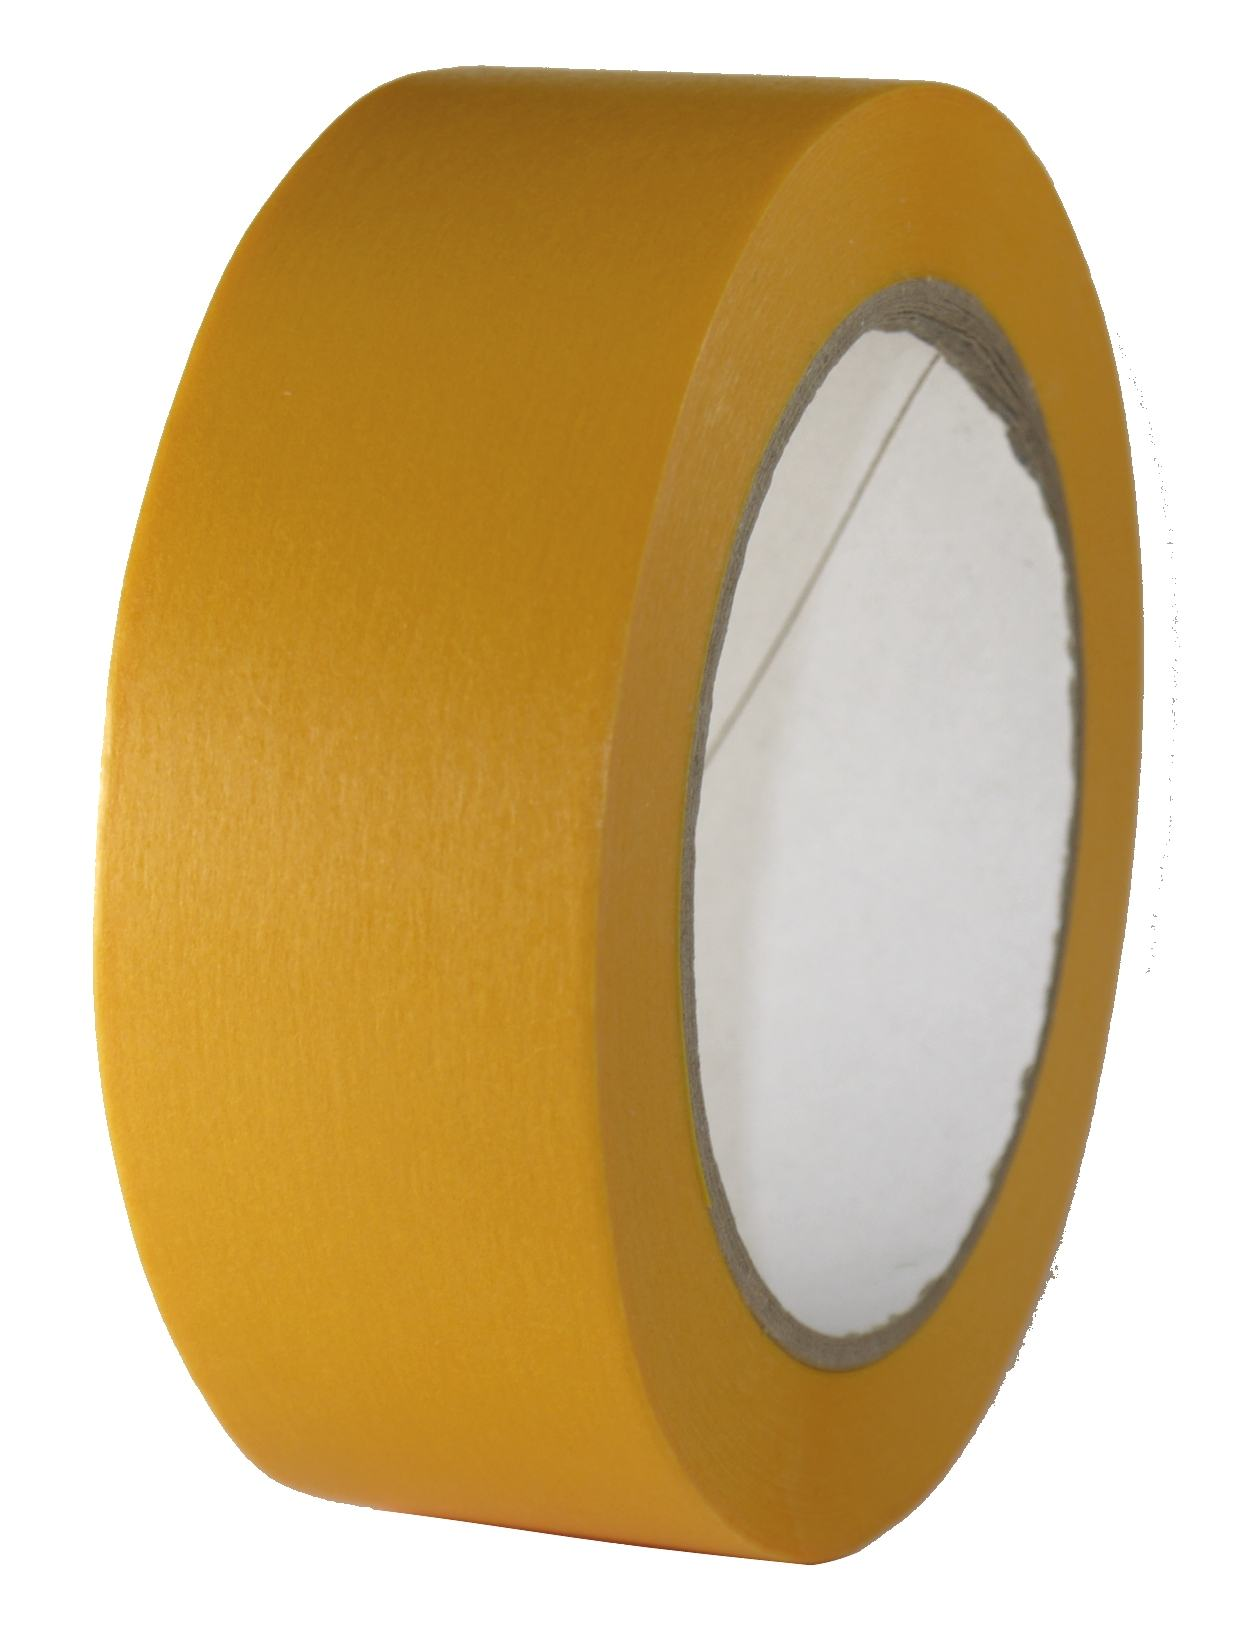 Lackierband Universal Gold/Orange 38mm/50m bis 100°C